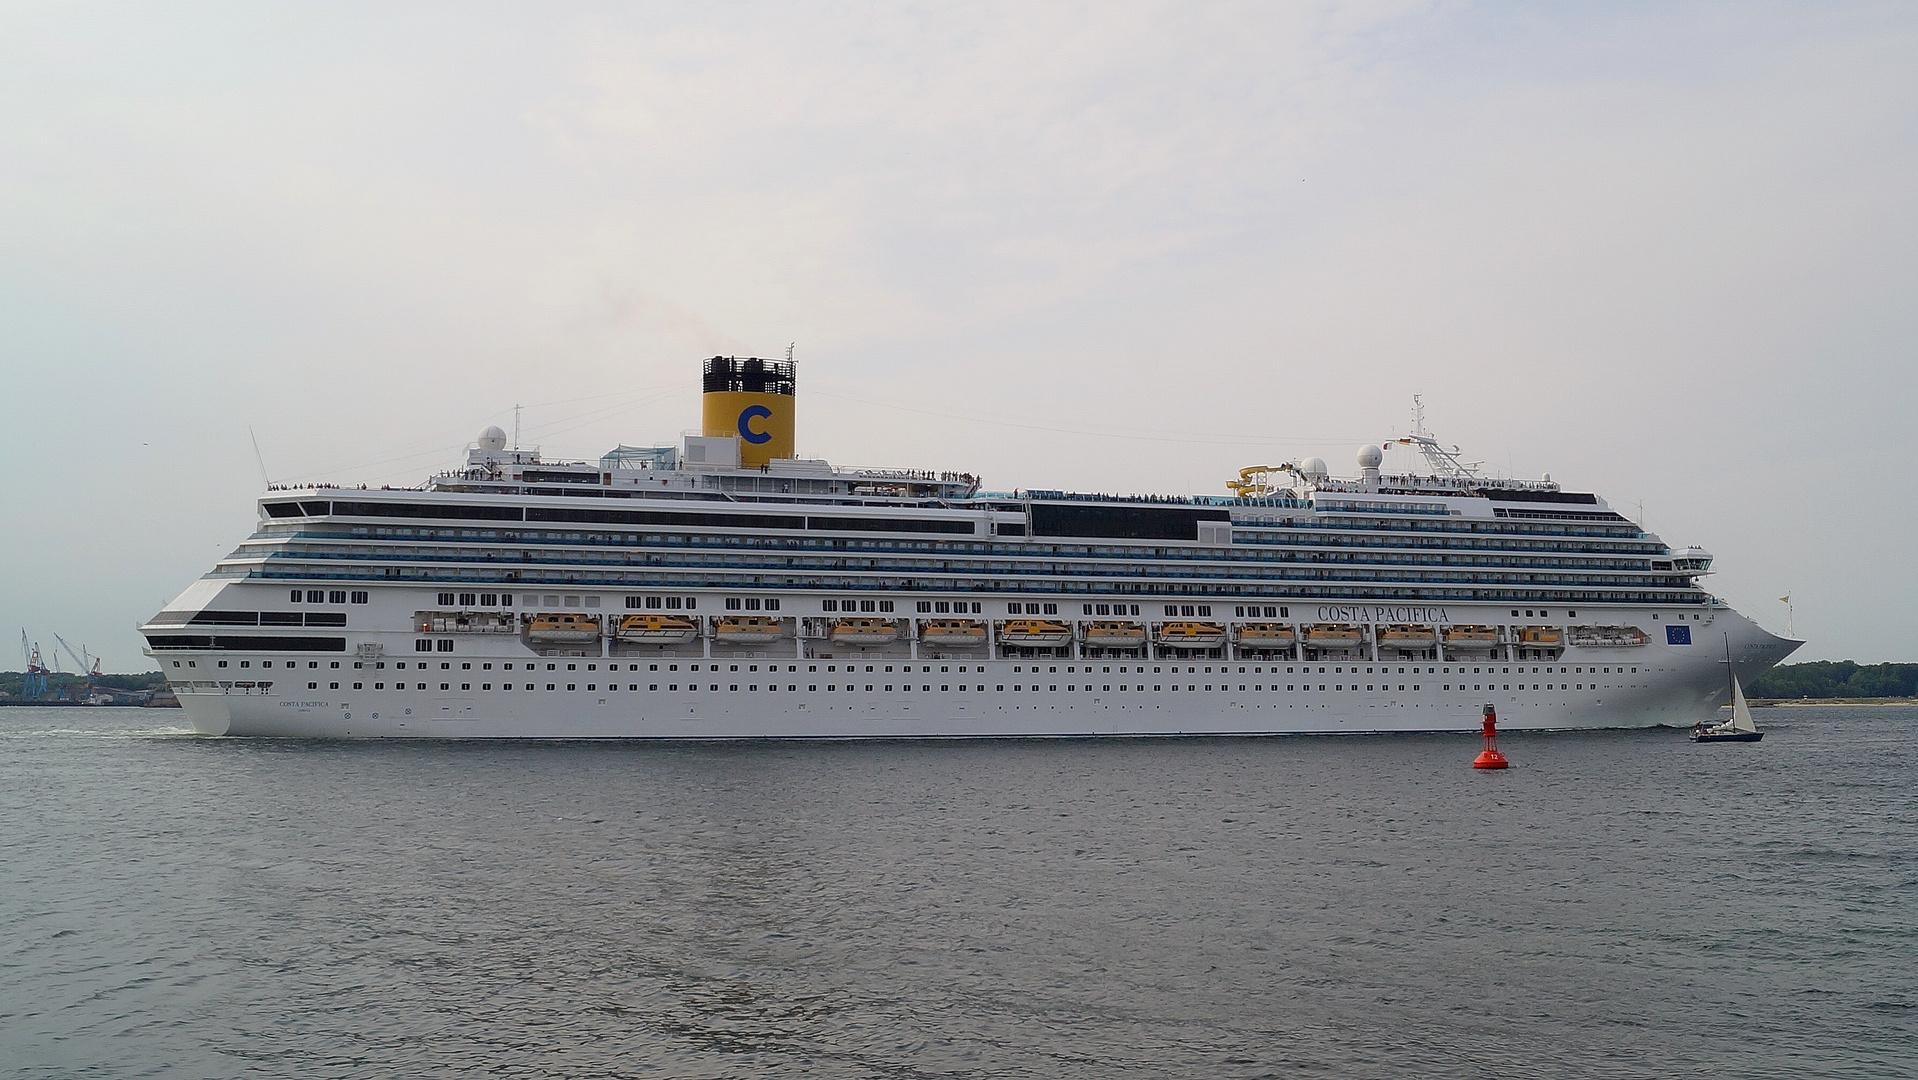 Costa Pacifica verläßt Kiel 20.07.2014 Bild 2